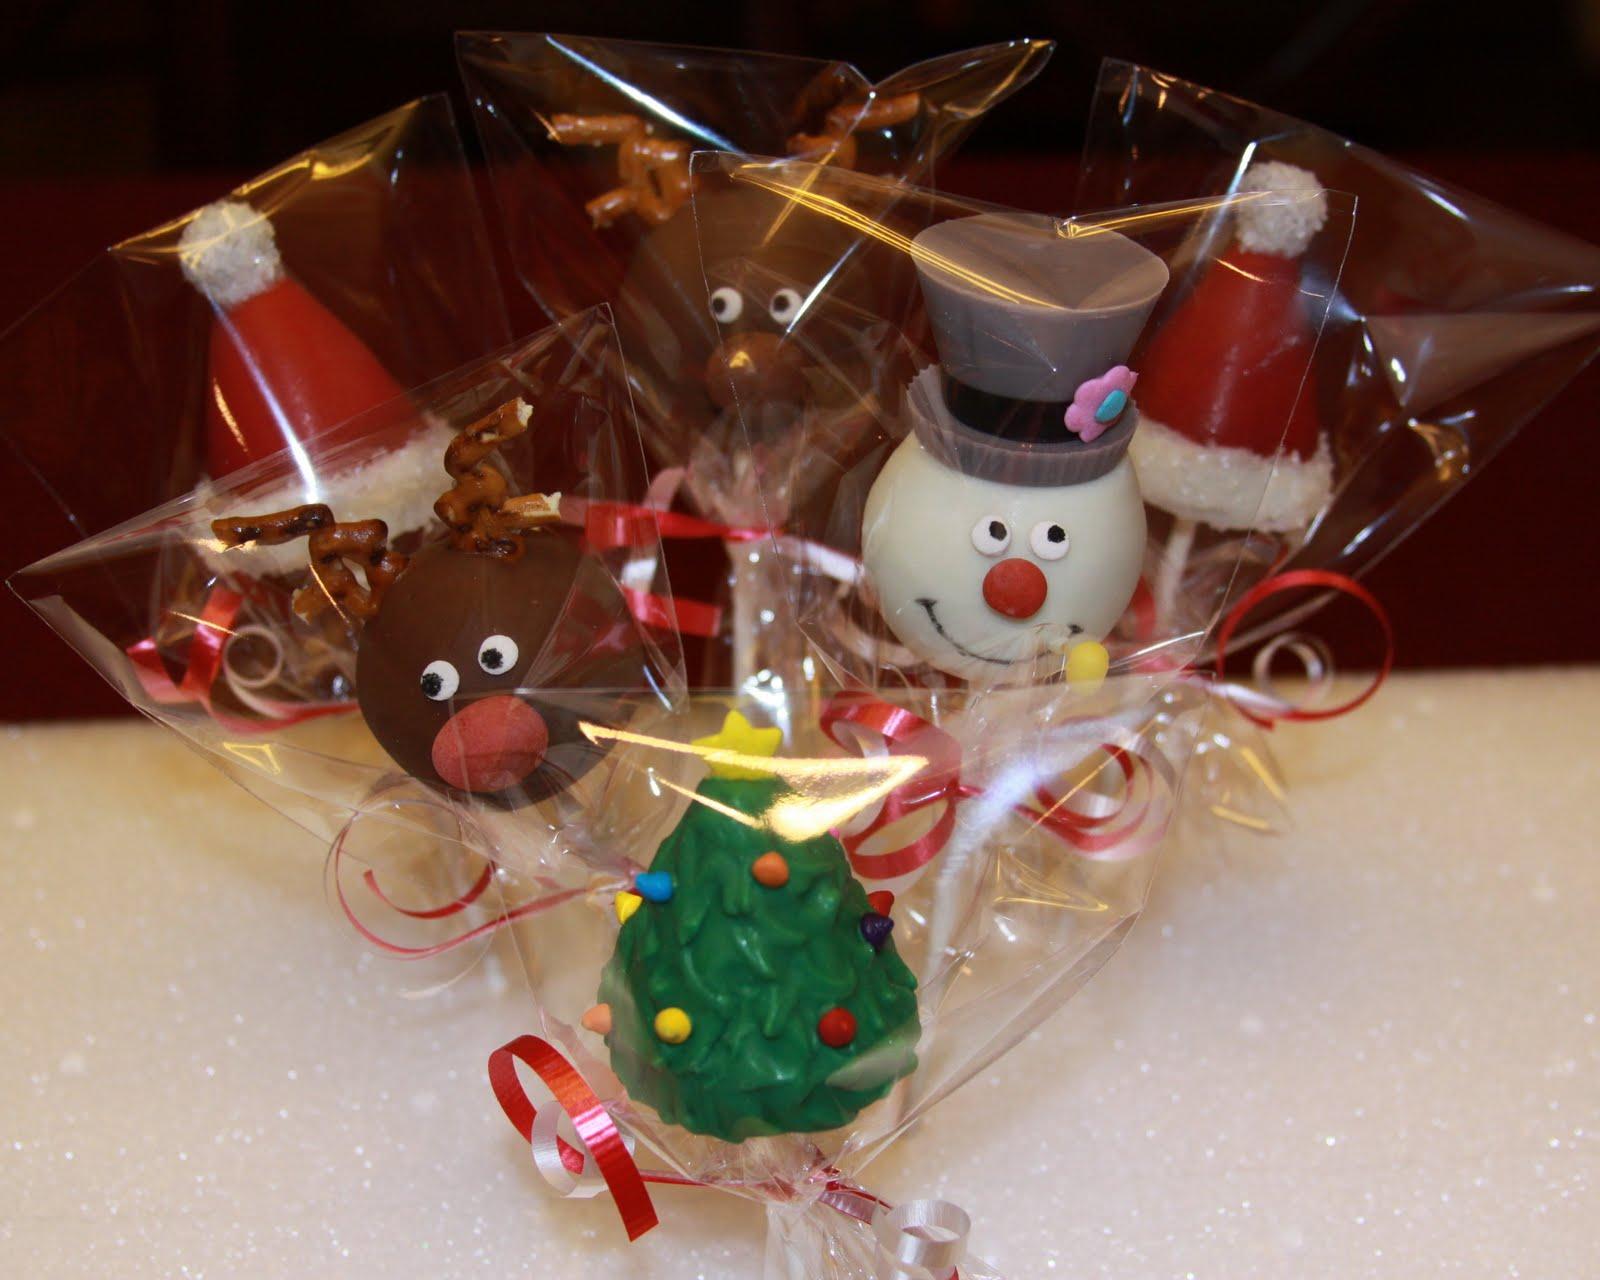 Christmas Decorated Cake Pops & Christmas Cake Pops | Christmas Cake Pops UK | Christmas Cake Pops ...